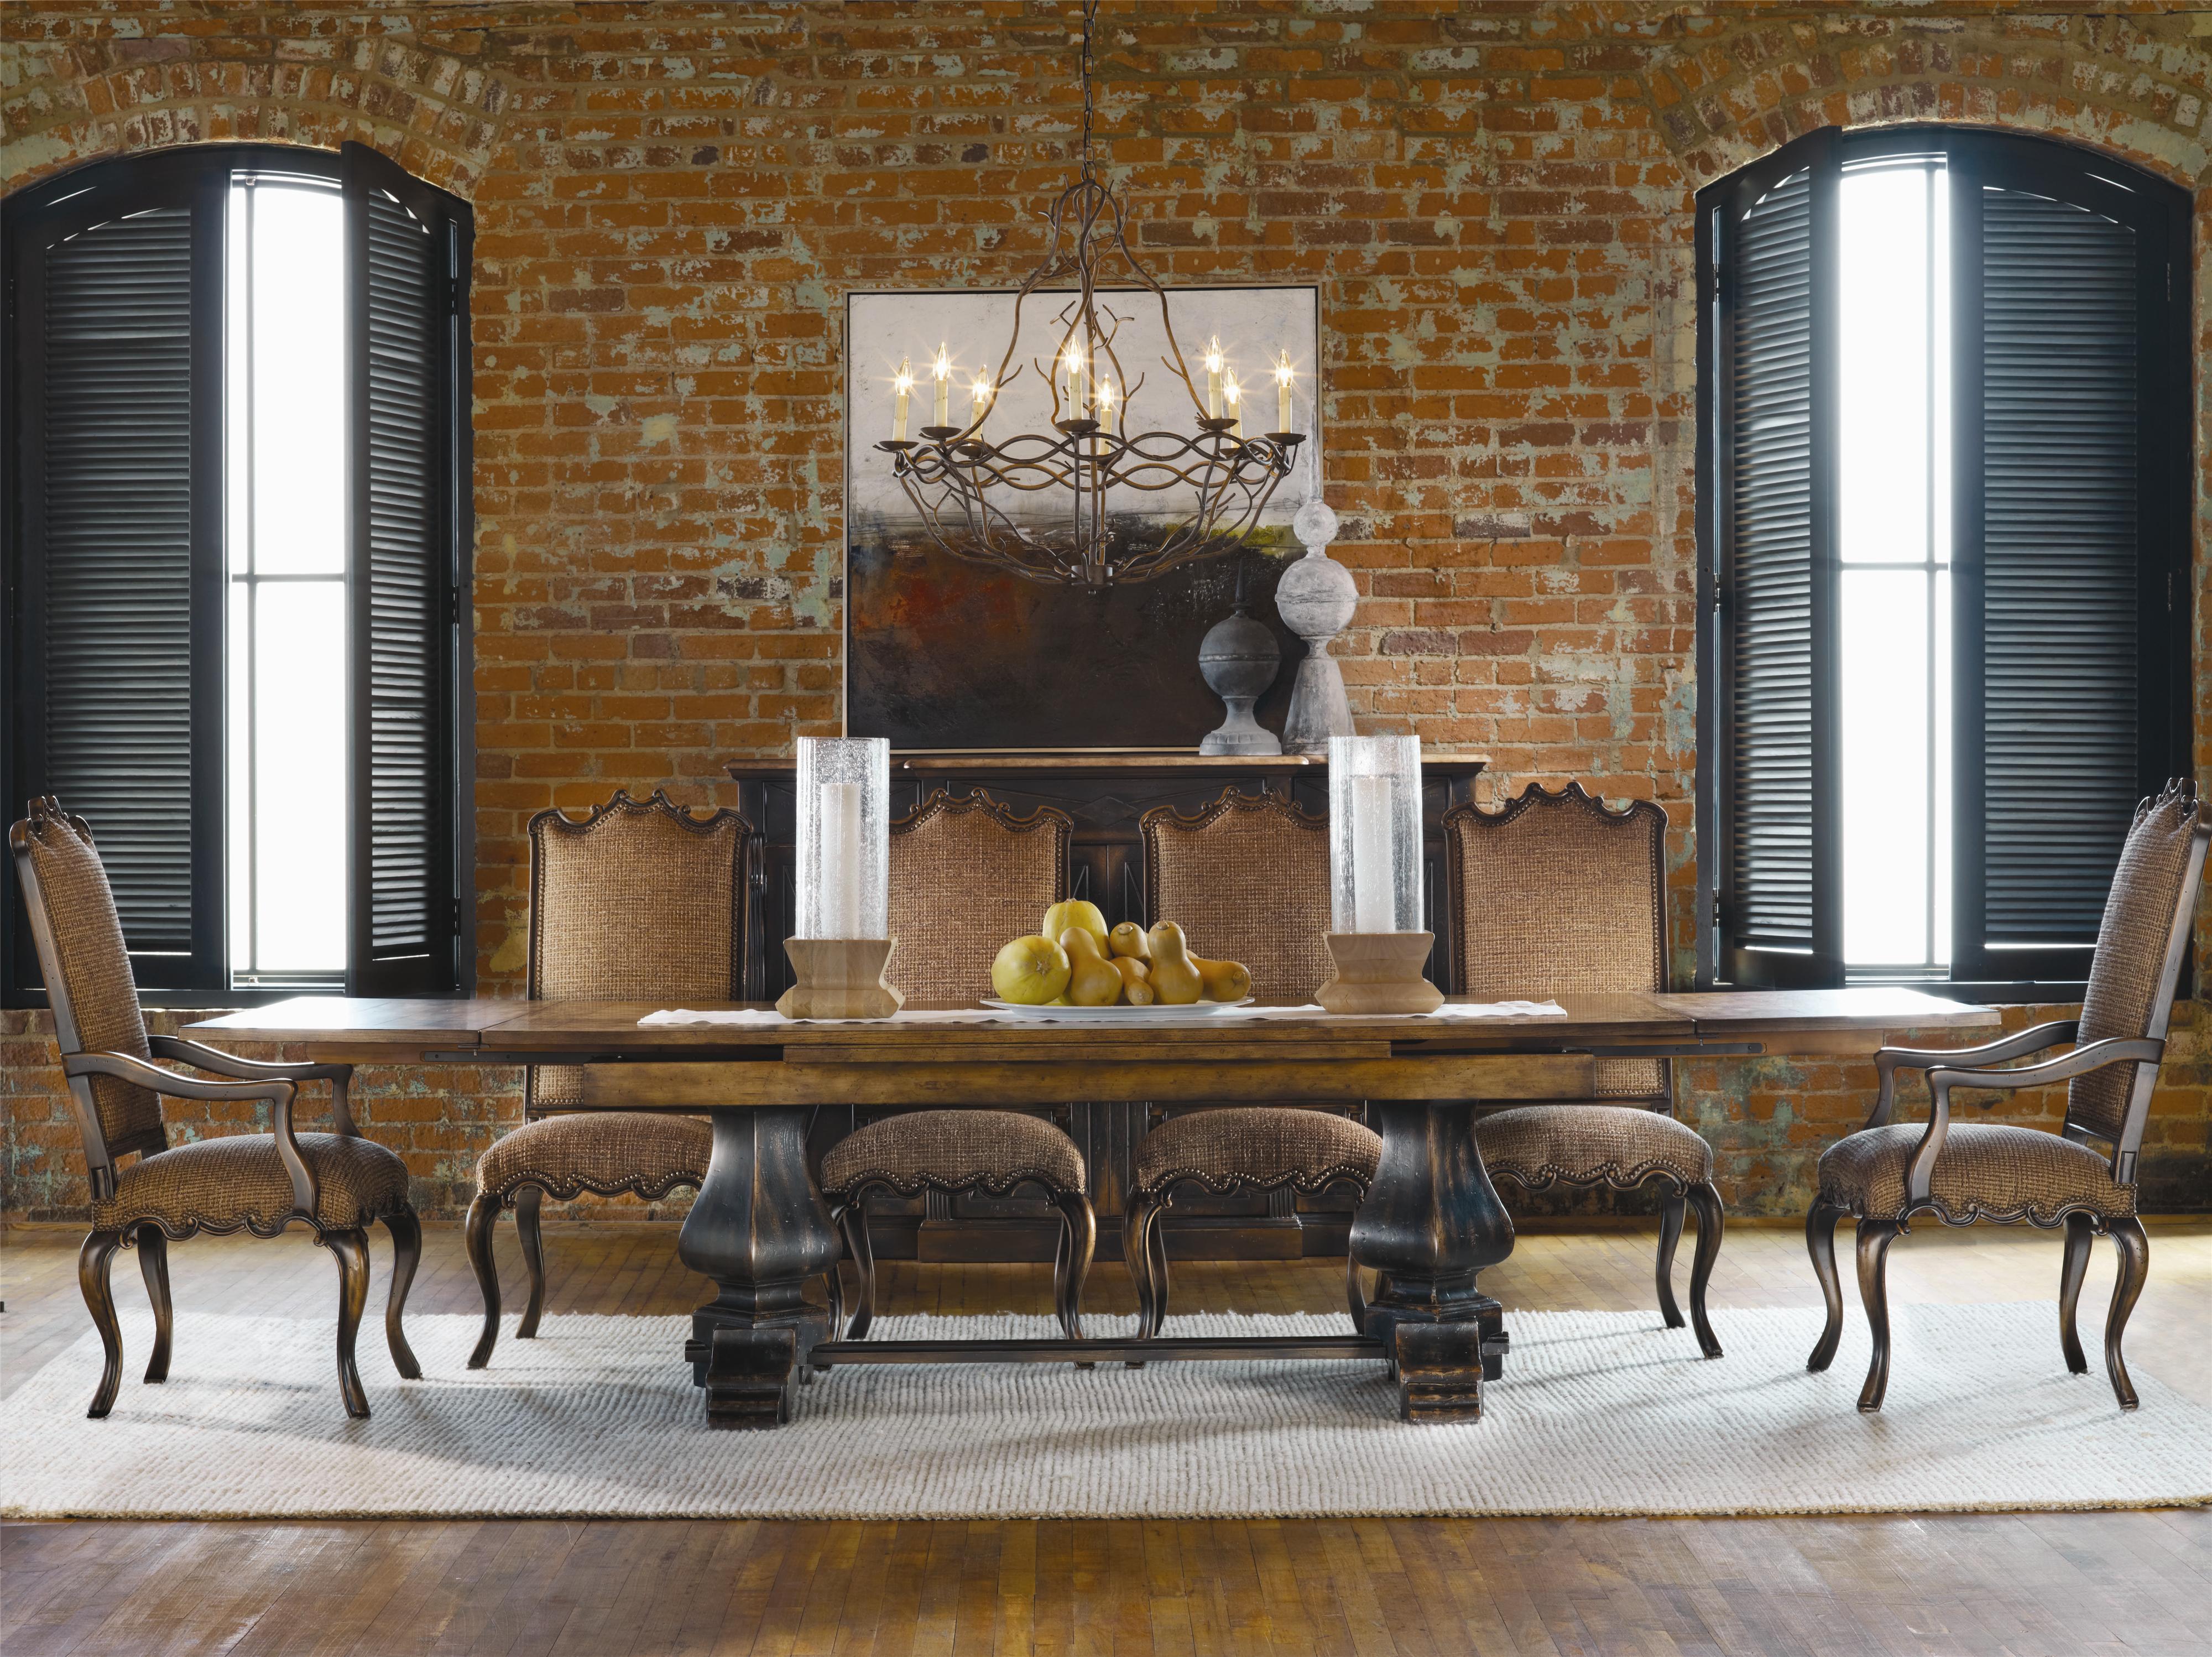 Hooker Furniture Sanctuary 7 Piece Table & Chair Set - Item Number: 3005-75207+2x200-351257+4x351258